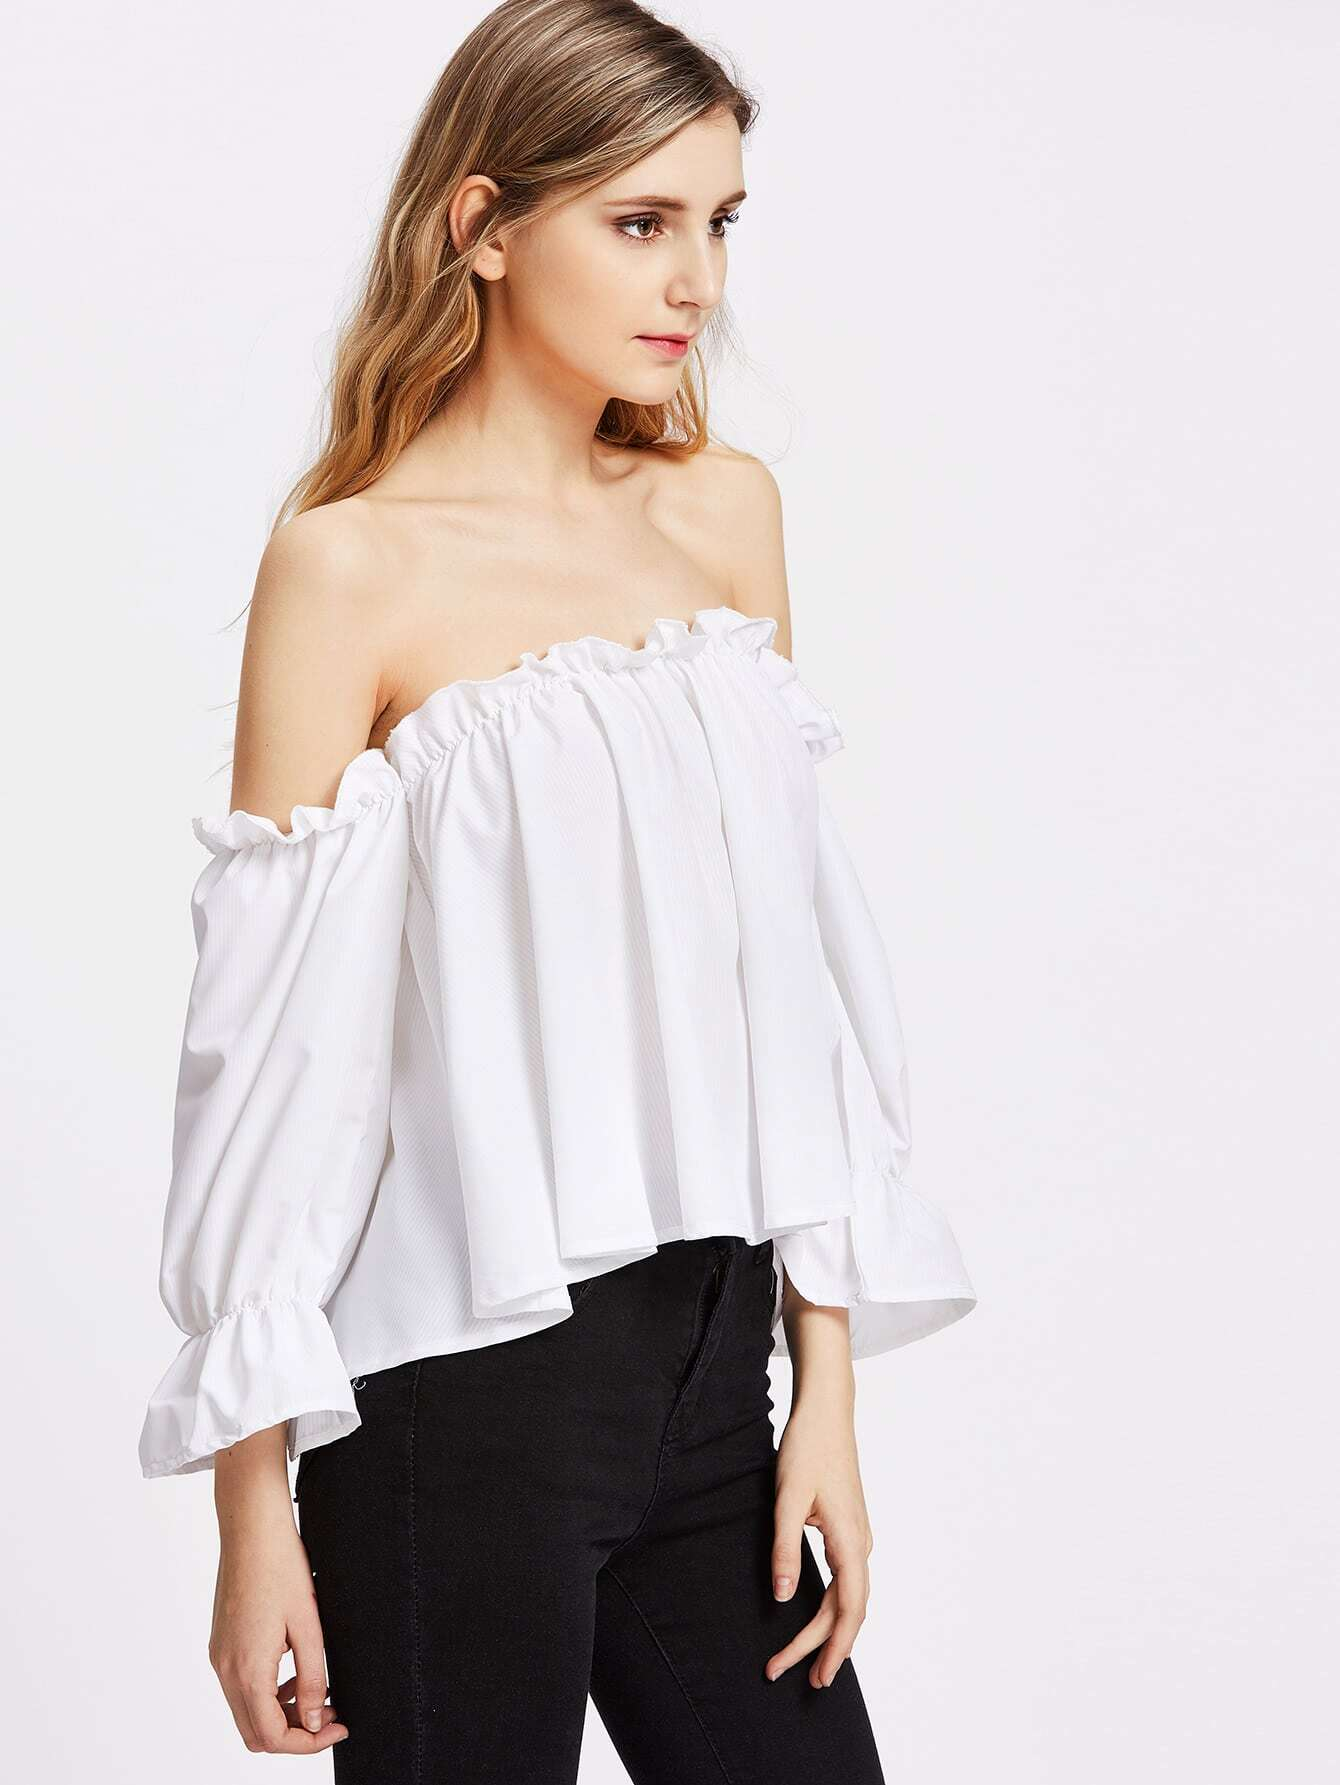 blouse170405451_2